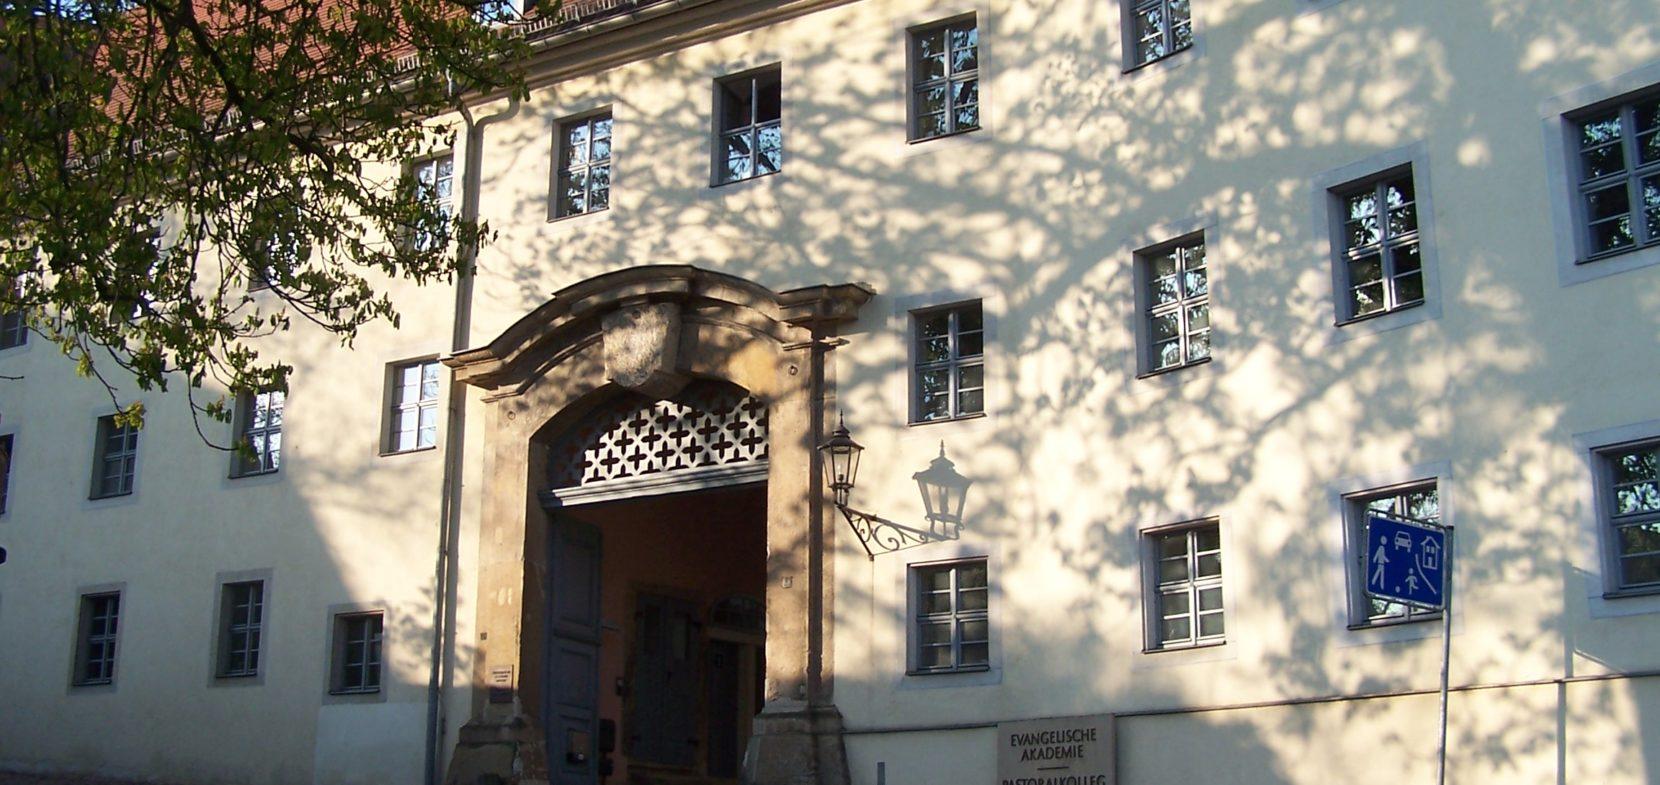 Eingang zum St.-Afra Klosterhof